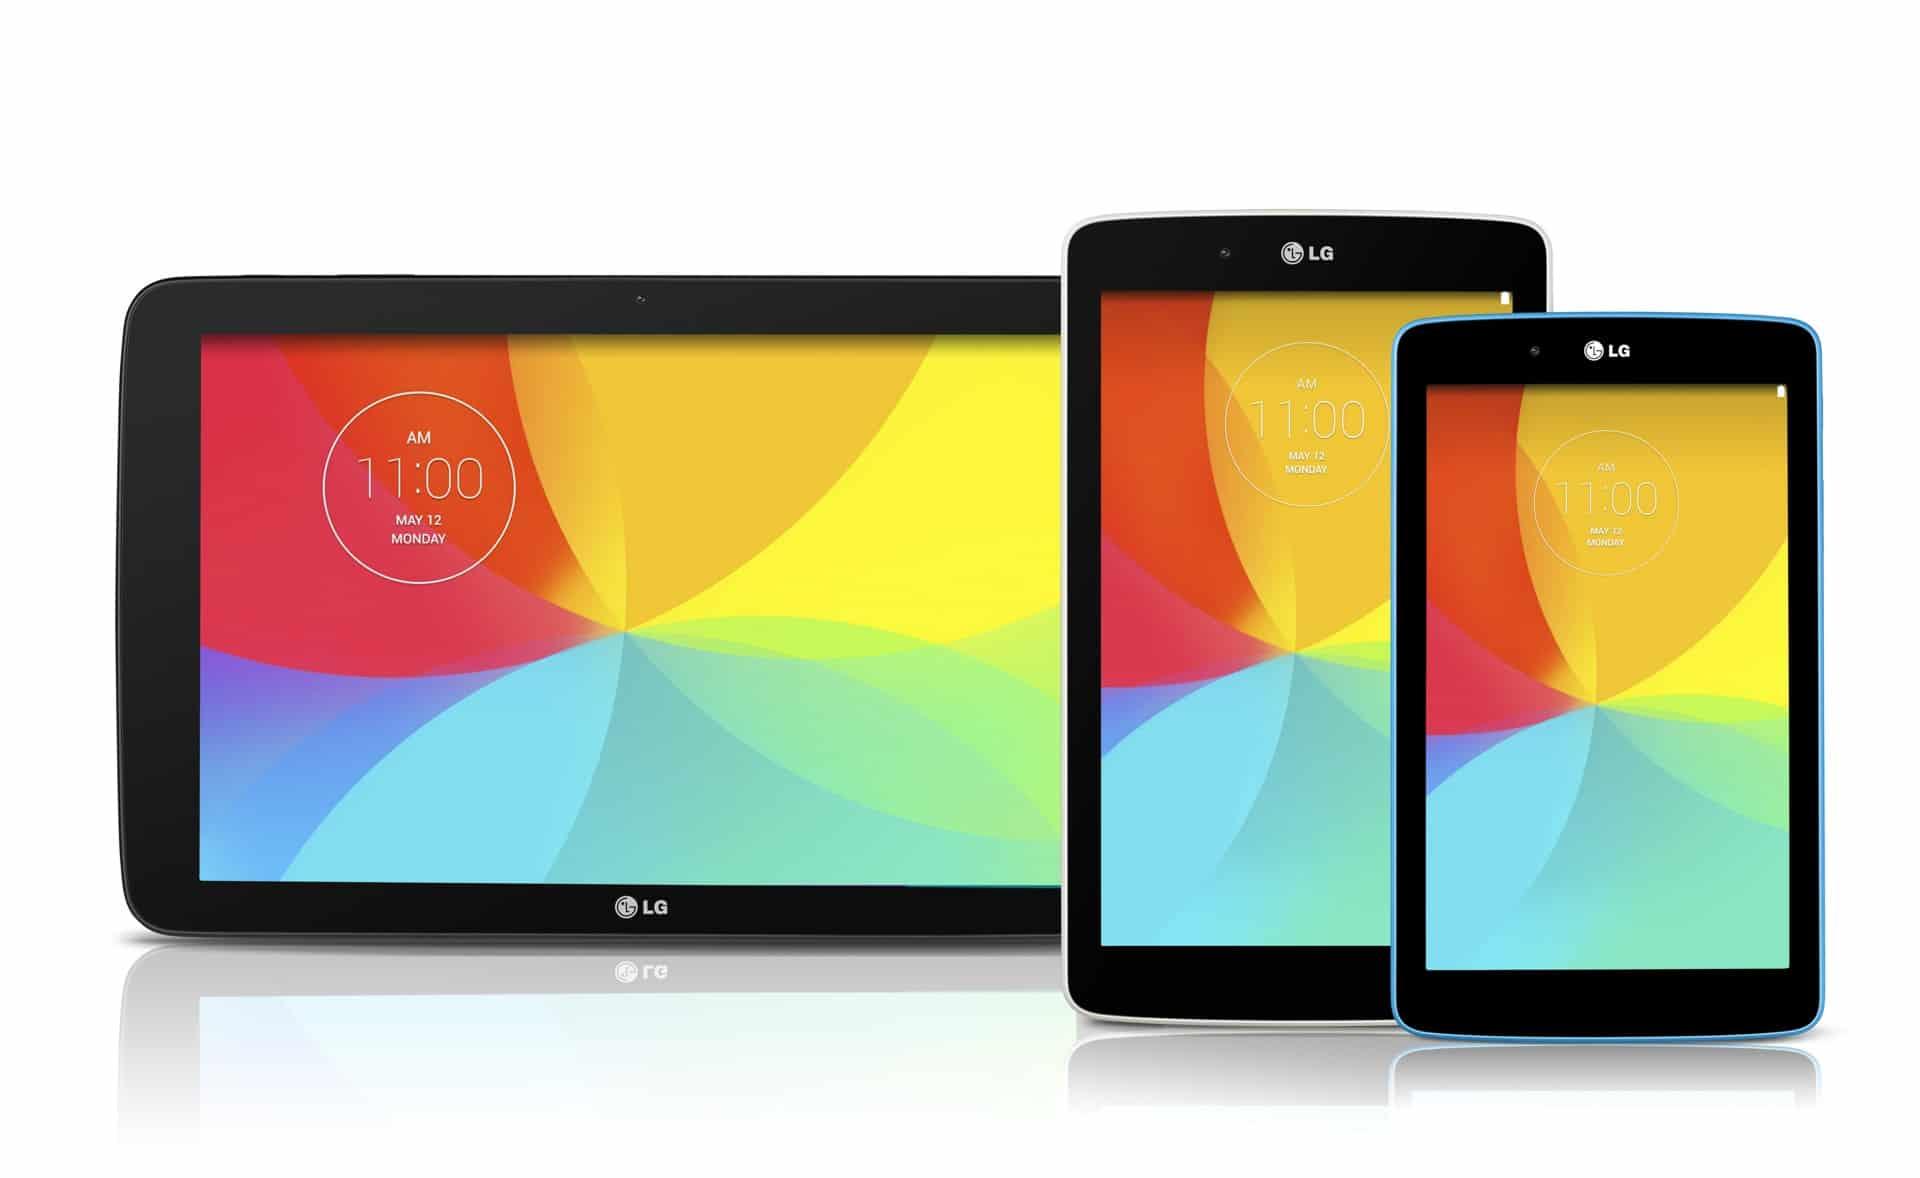 LG GPad 8.0 7.0 10.1 AH 1.1